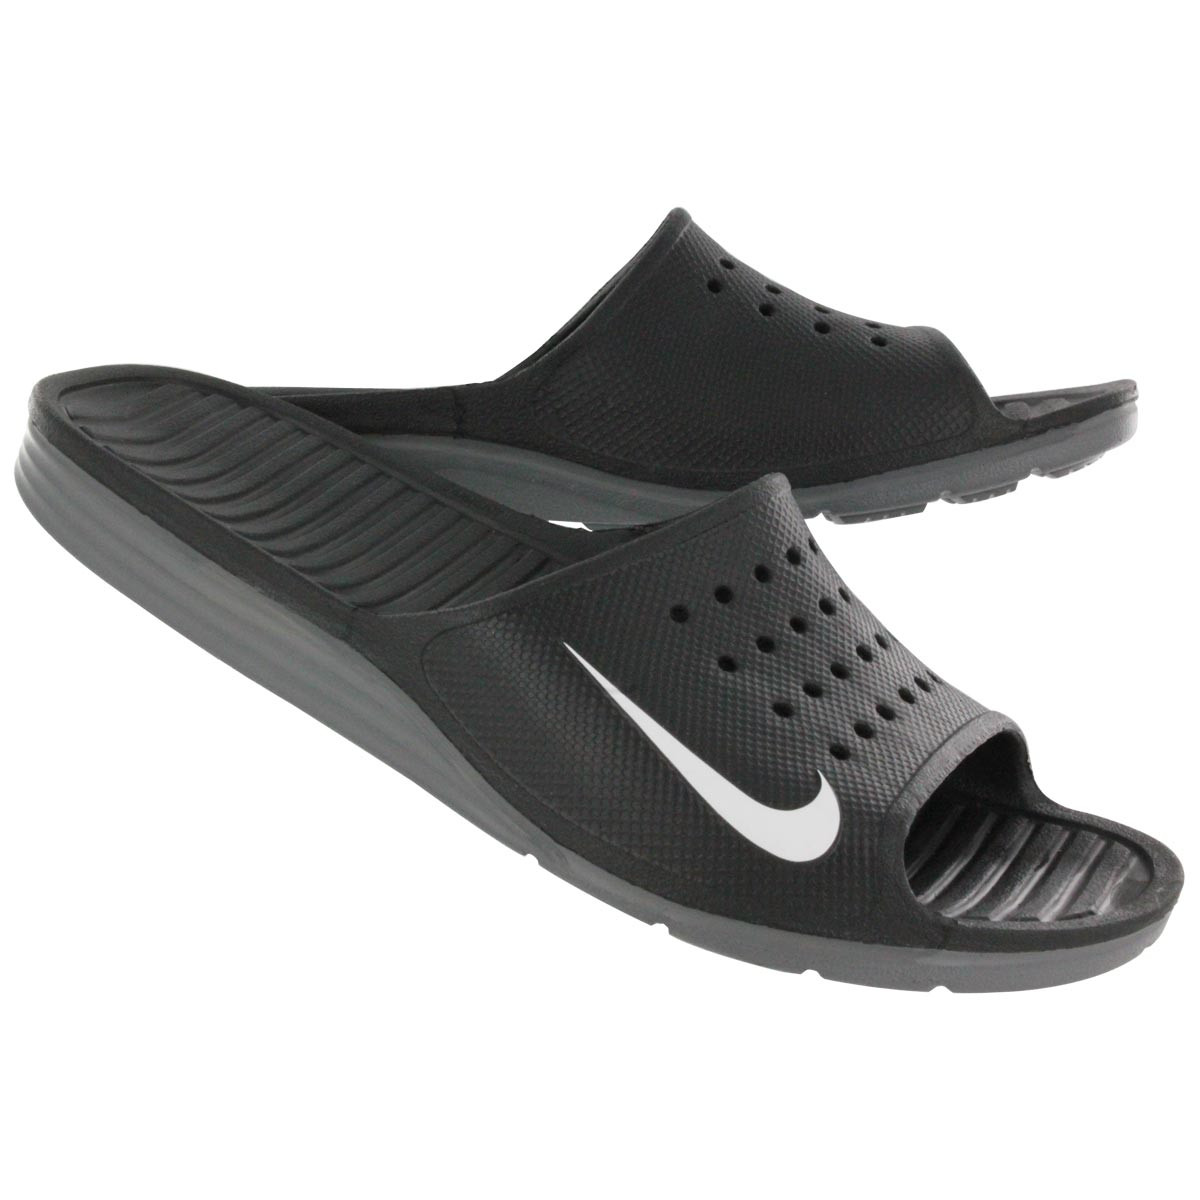 c0e858c0 Шлепанцы Nike Solarsoft Slide, Код - 386163-011: продажа, цена в ...